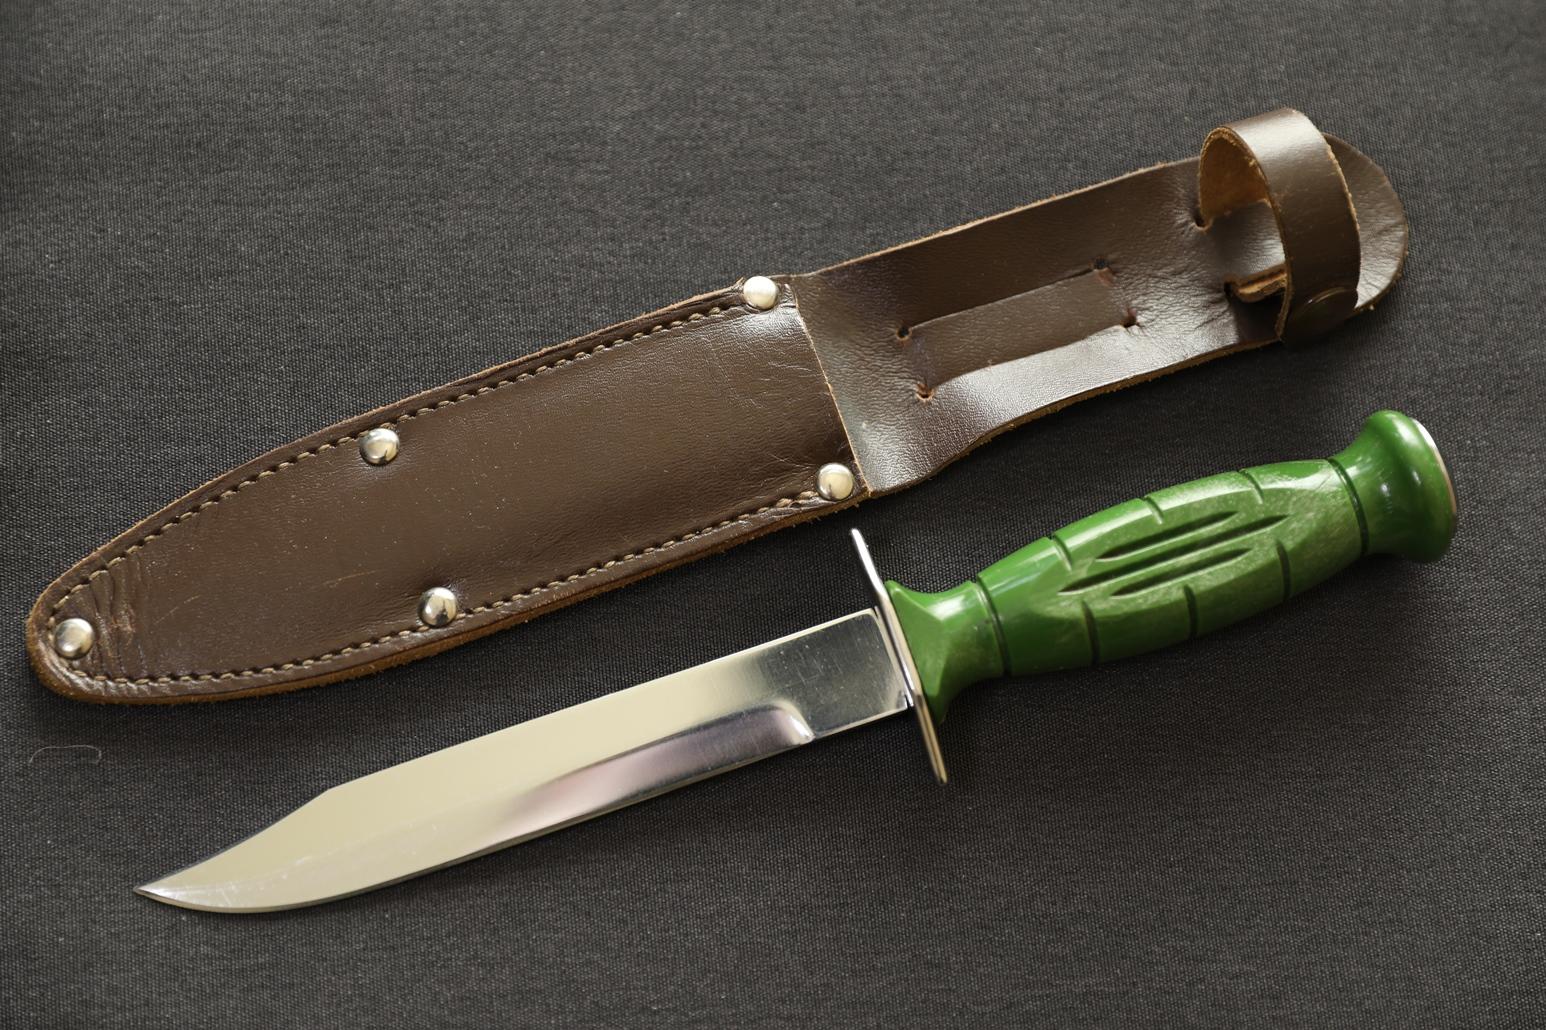 Нож Разведчика «Вишня» НР-43 1952 год